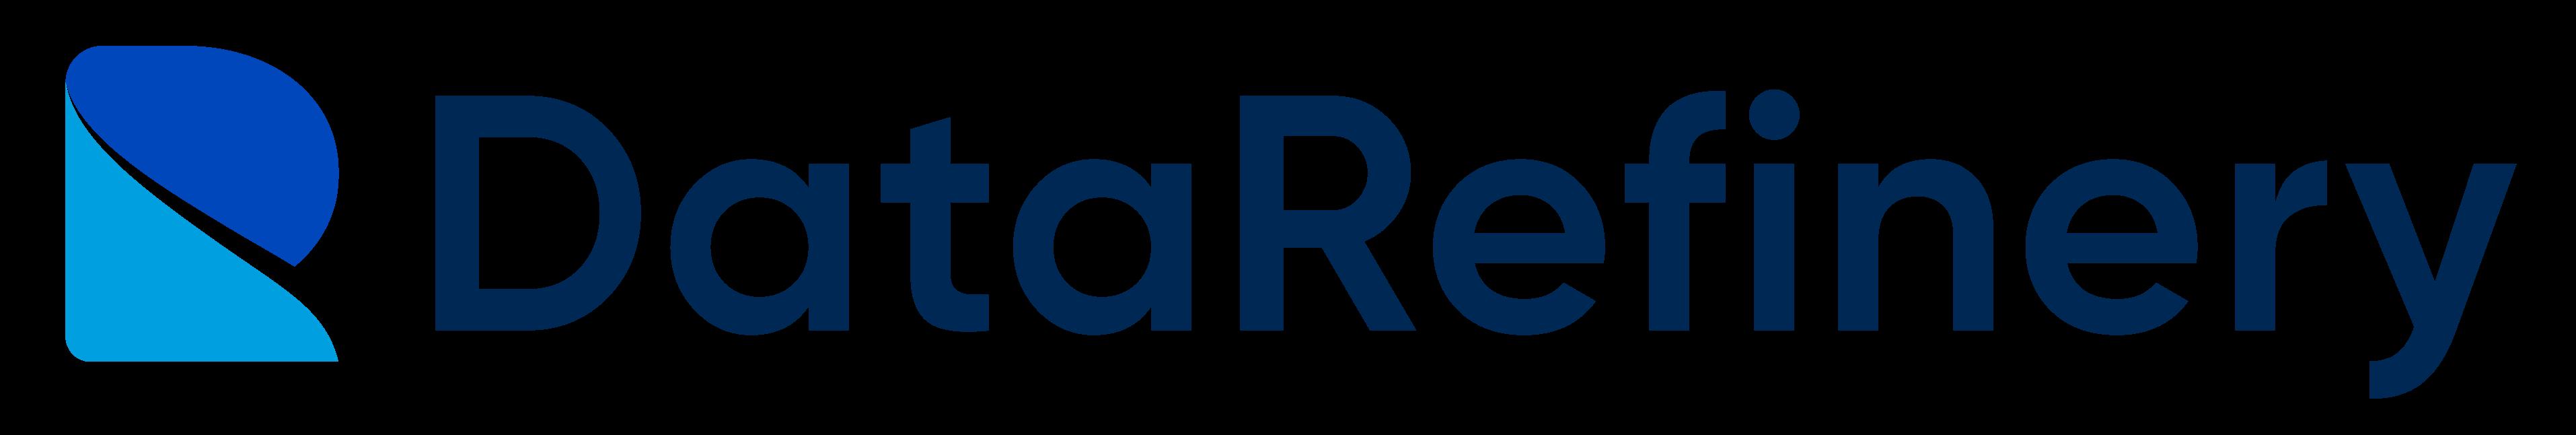 Data Refinery logo dark